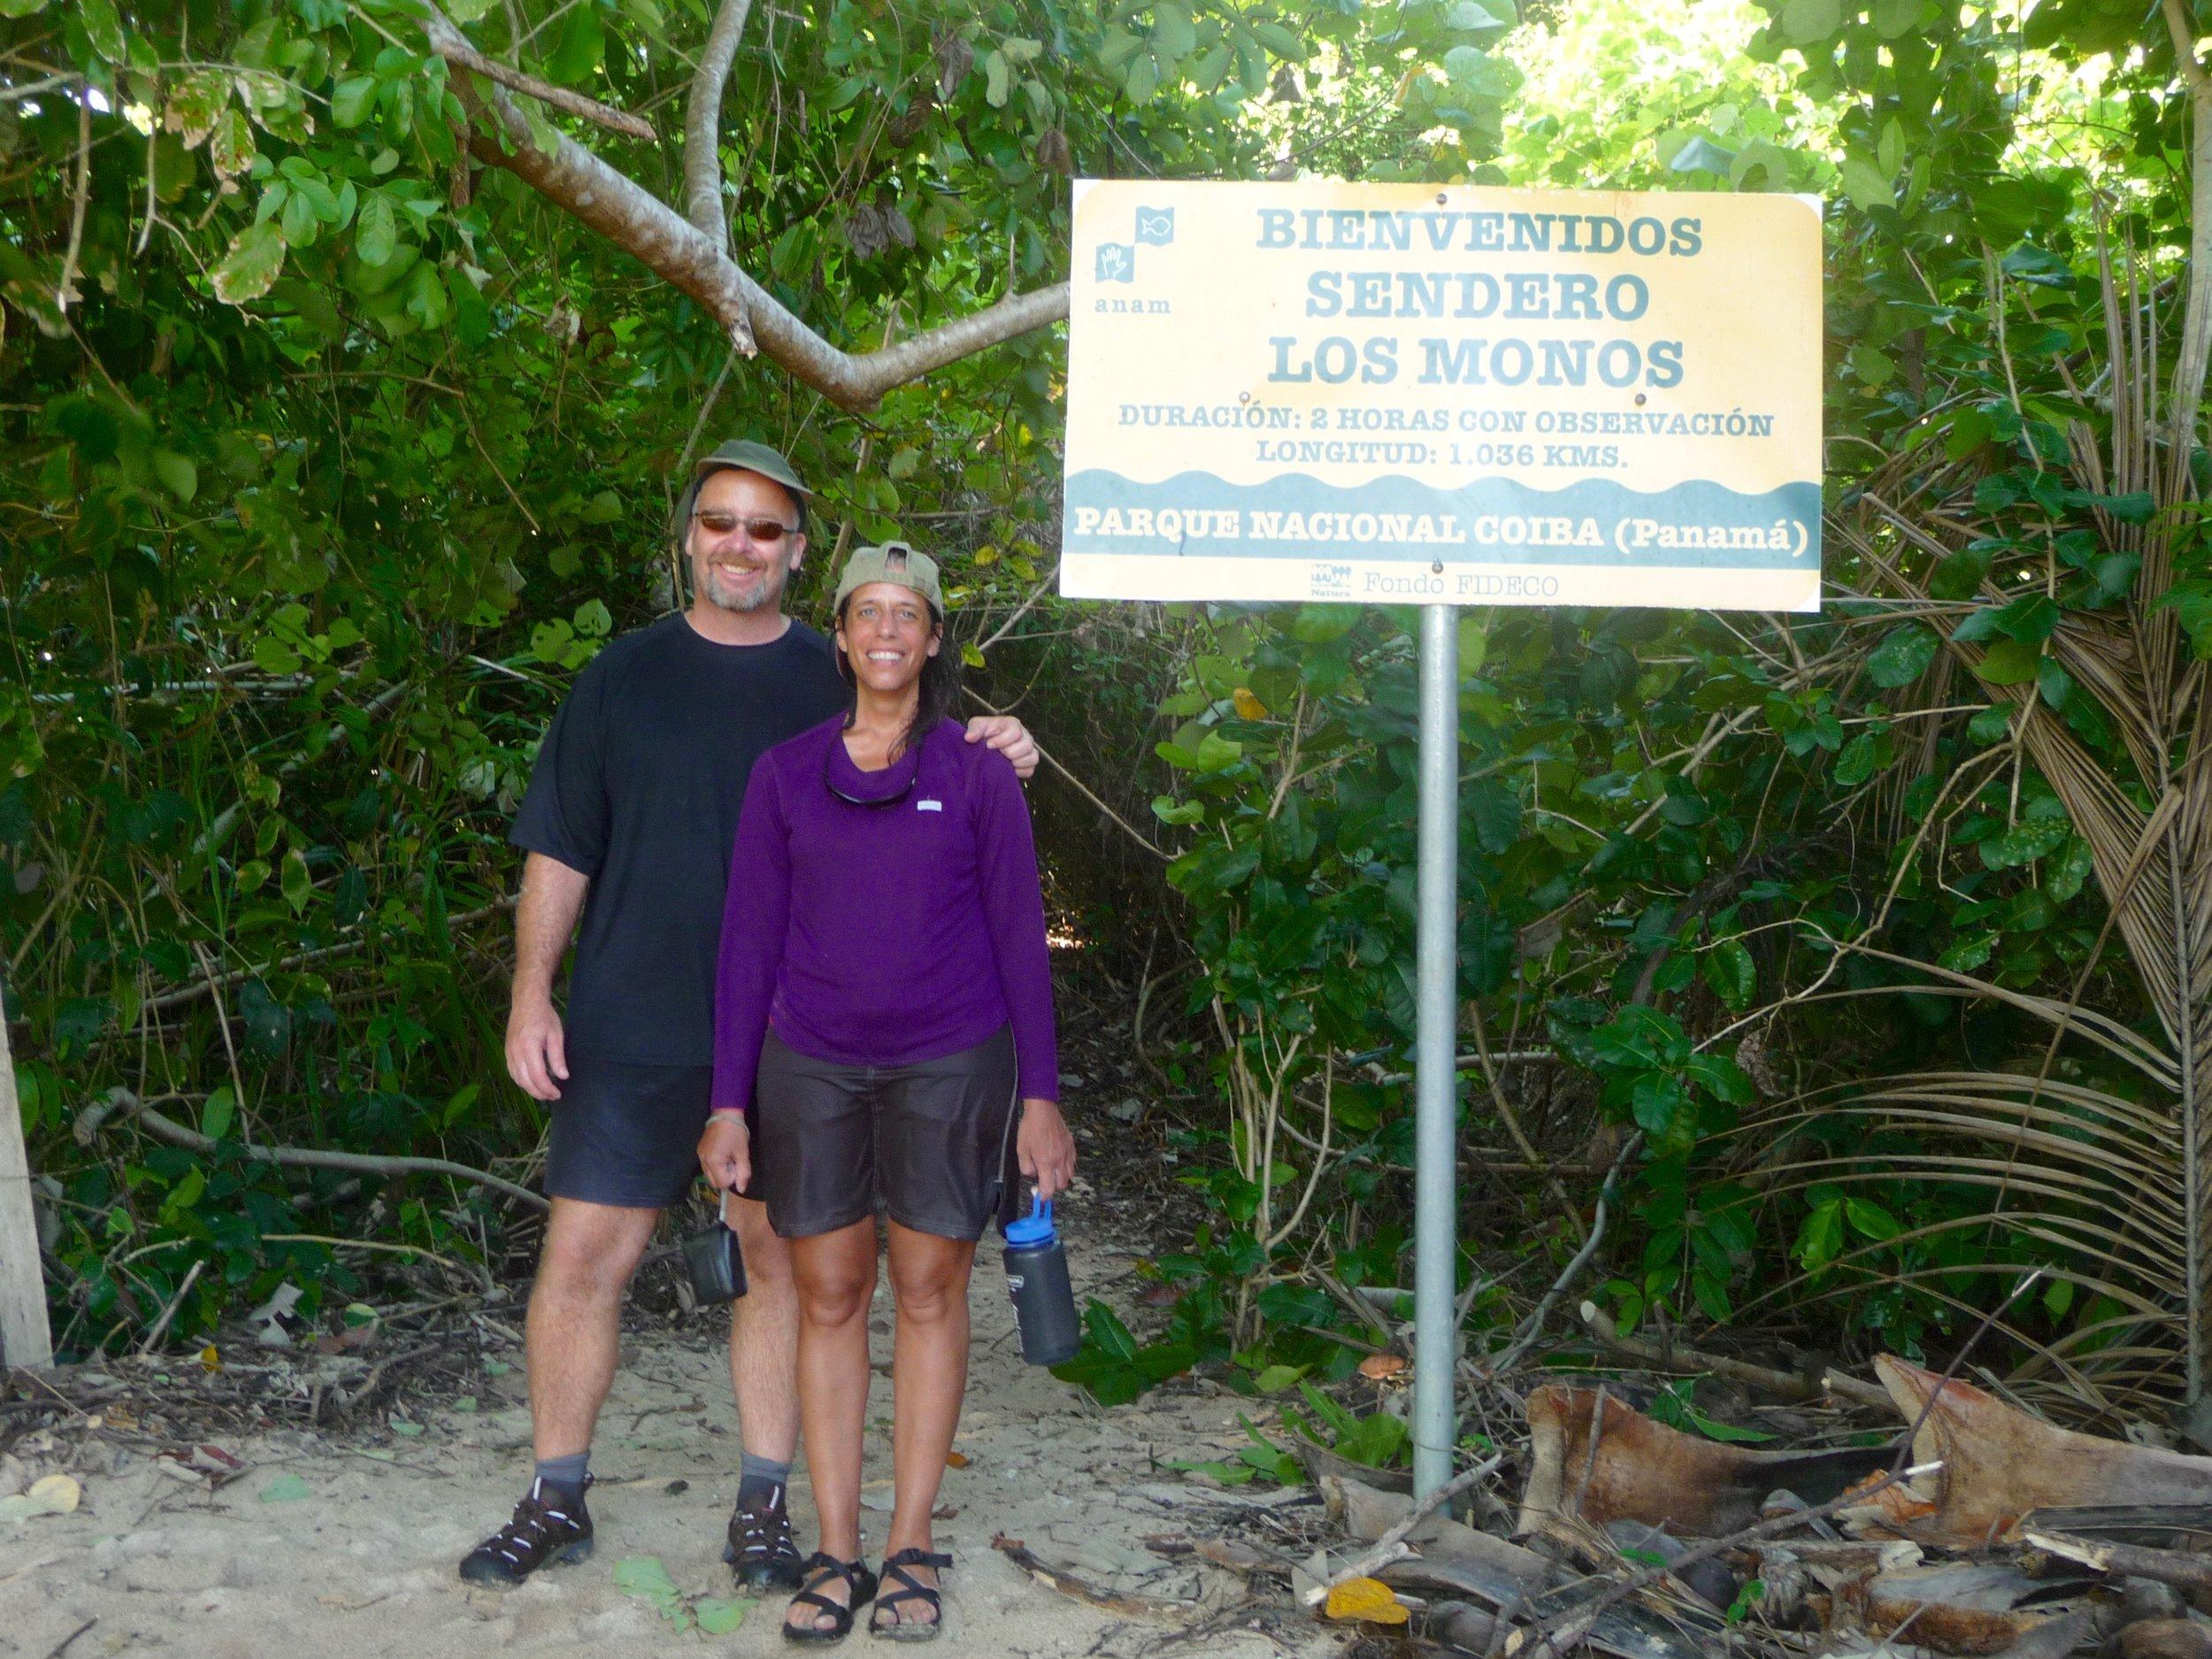 Coiba National Park, Santa Catalina, Panama, Fluid Adventures, Sea Kayak, UNESCO World Heritage Site, Snorkeling, Pacific Ocean, Veraguas, Adventure Trip, Hiking, Bird Watching, Exotic Birds